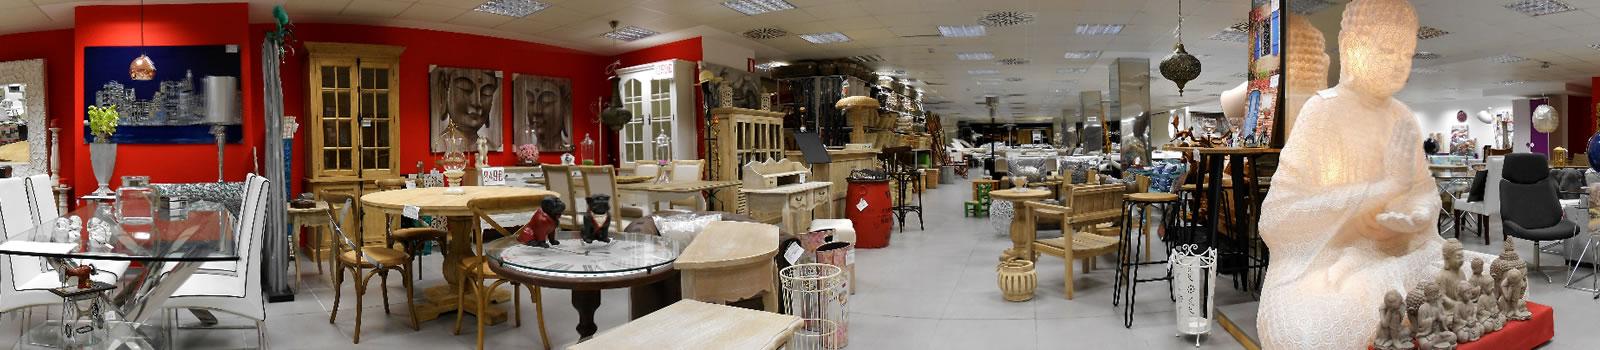 central mimbrera en palma, tienda de decoración en mallorca